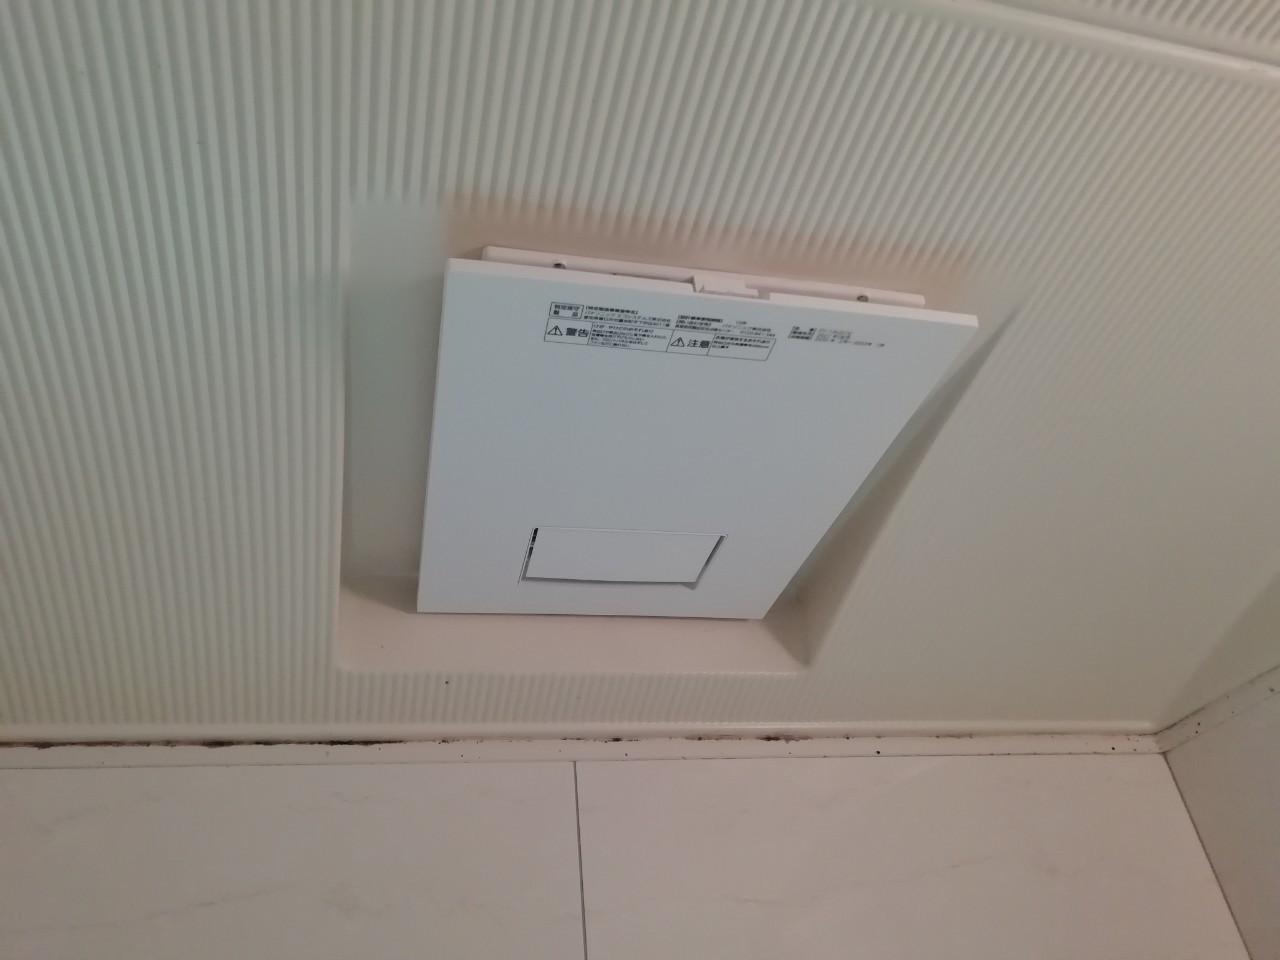 浴室暖房乾燥機の交換工事 FY-13UG7E 京都市北区